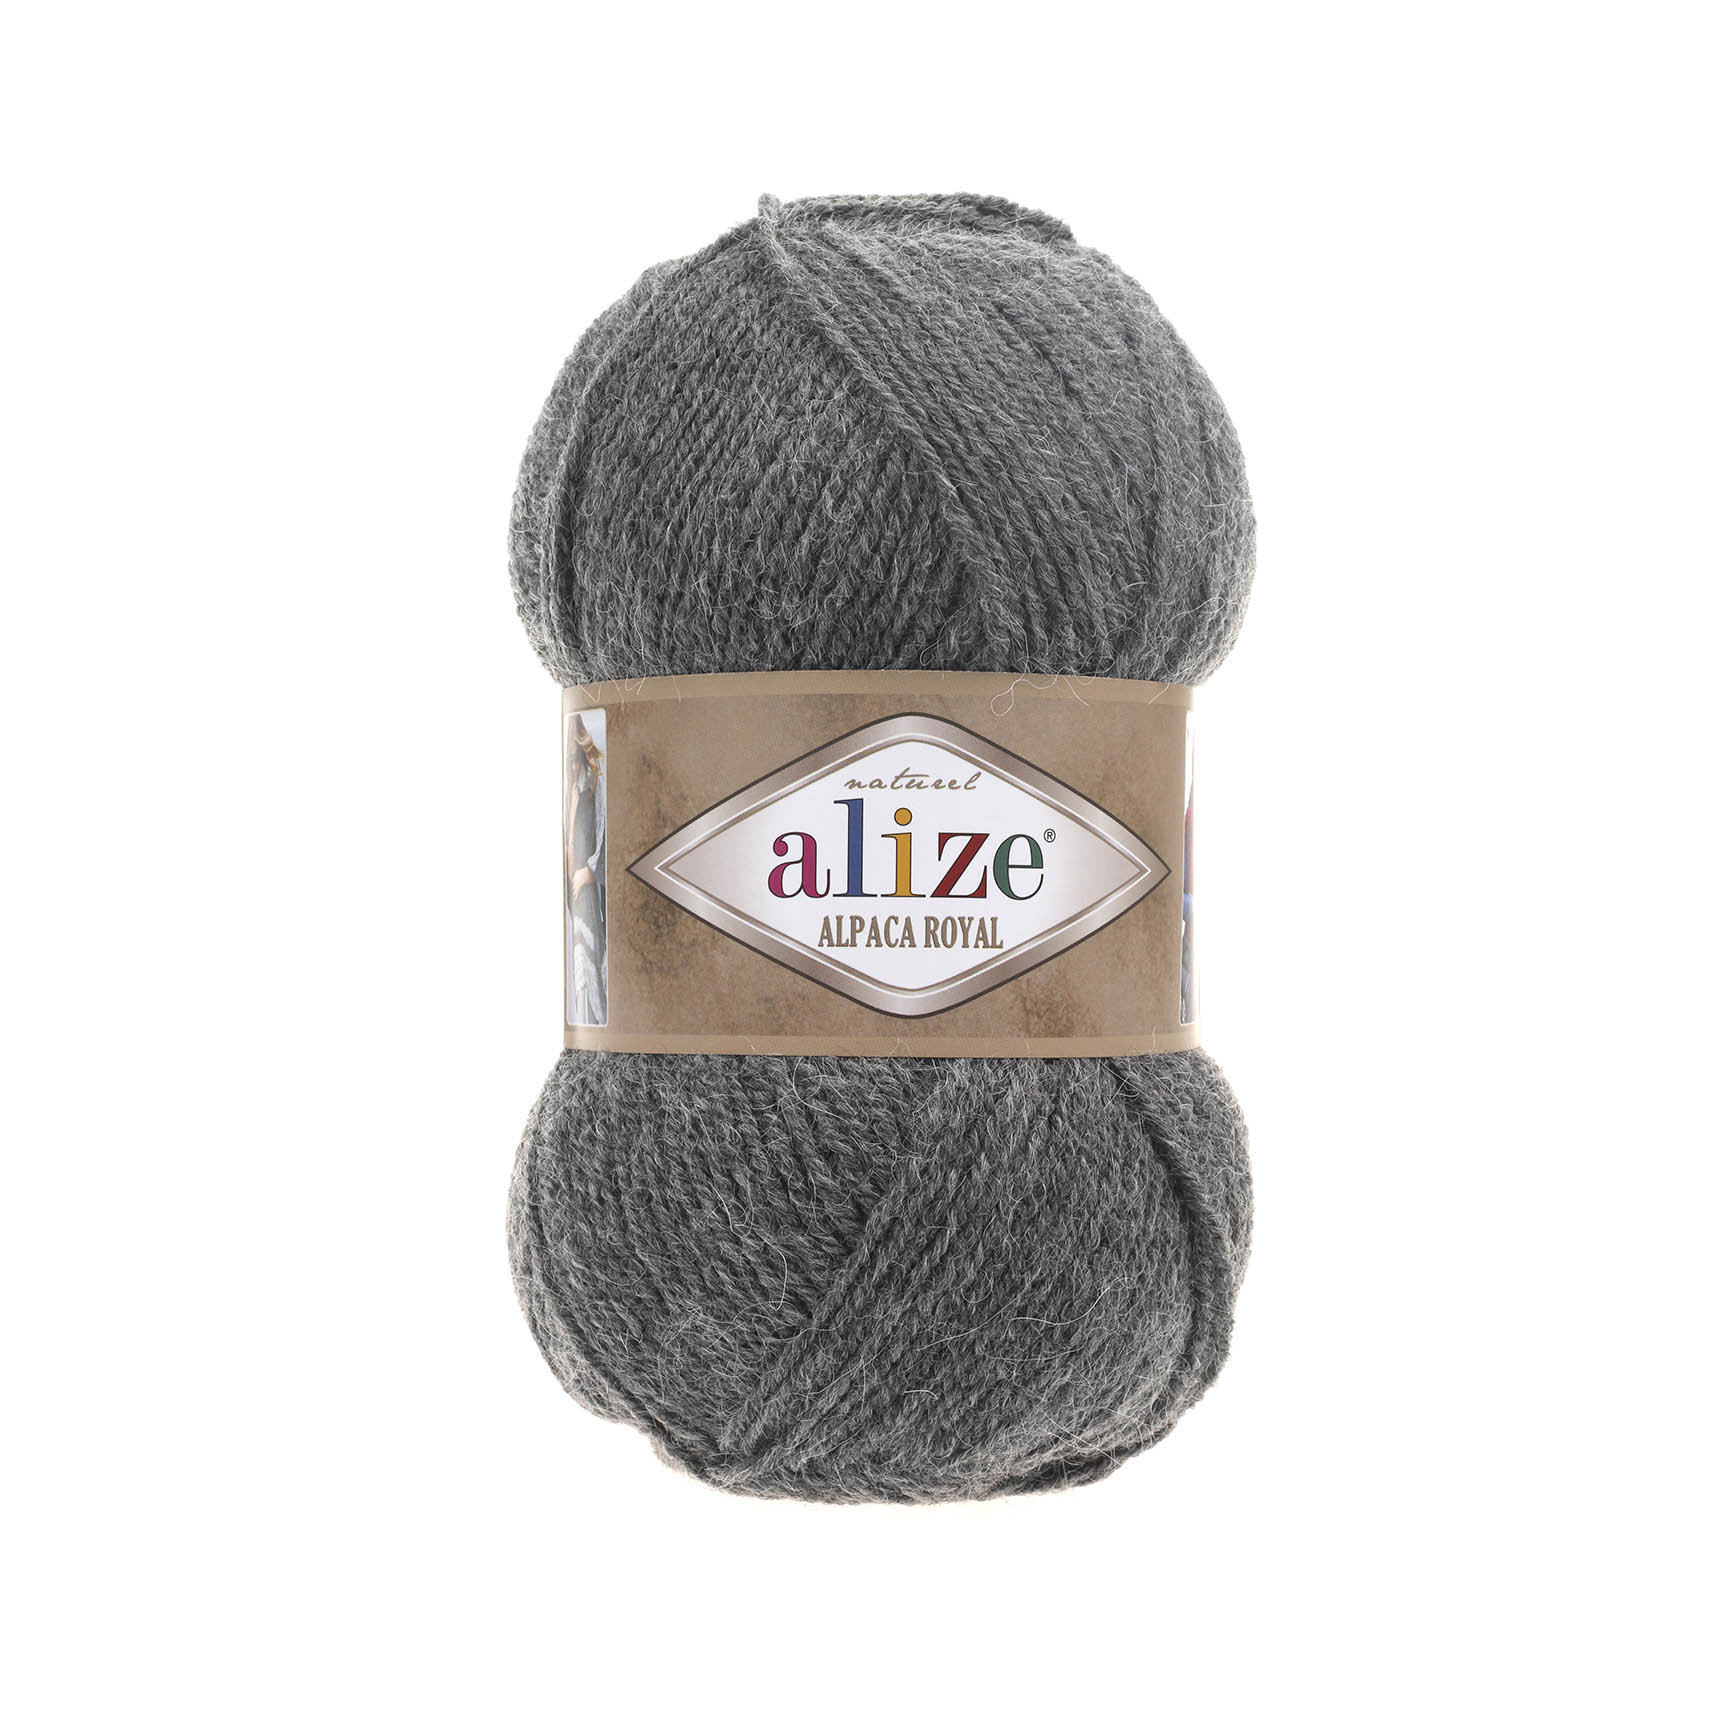 Пряжа Alize Alpaca Royal серый 196